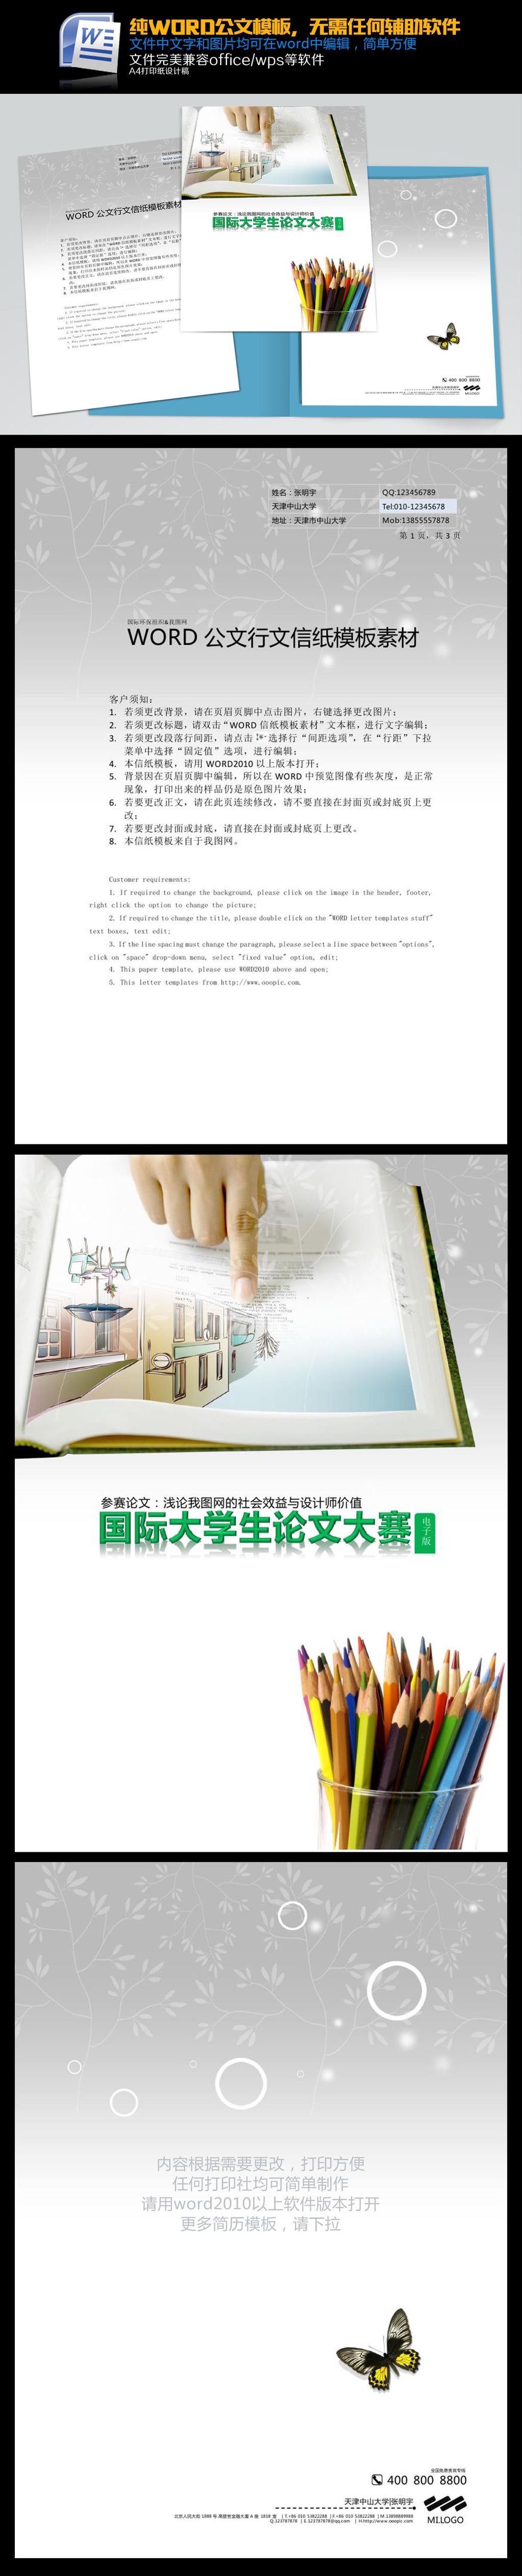 word卡通信纸模板模板下载 图片下载